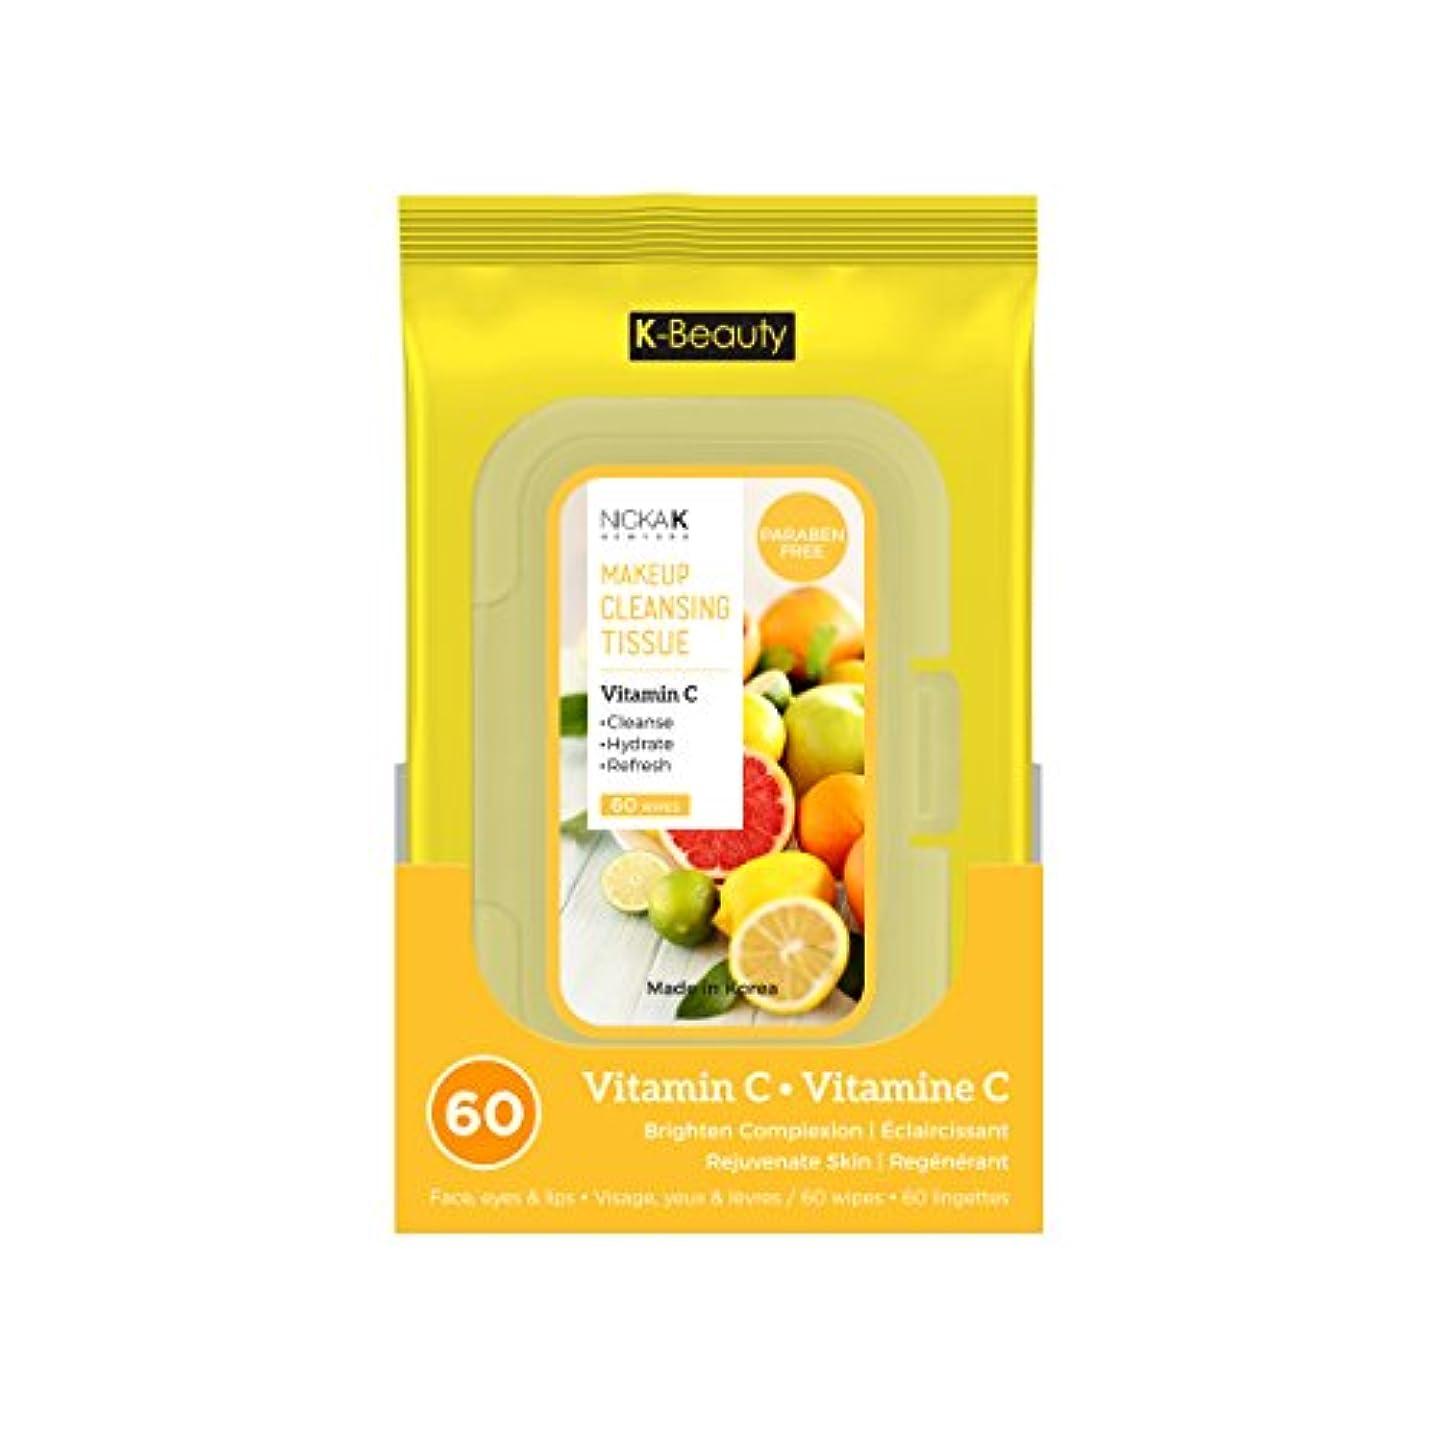 NICKA K Make Up Cleansing Tissue - Vitamin C (並行輸入品)